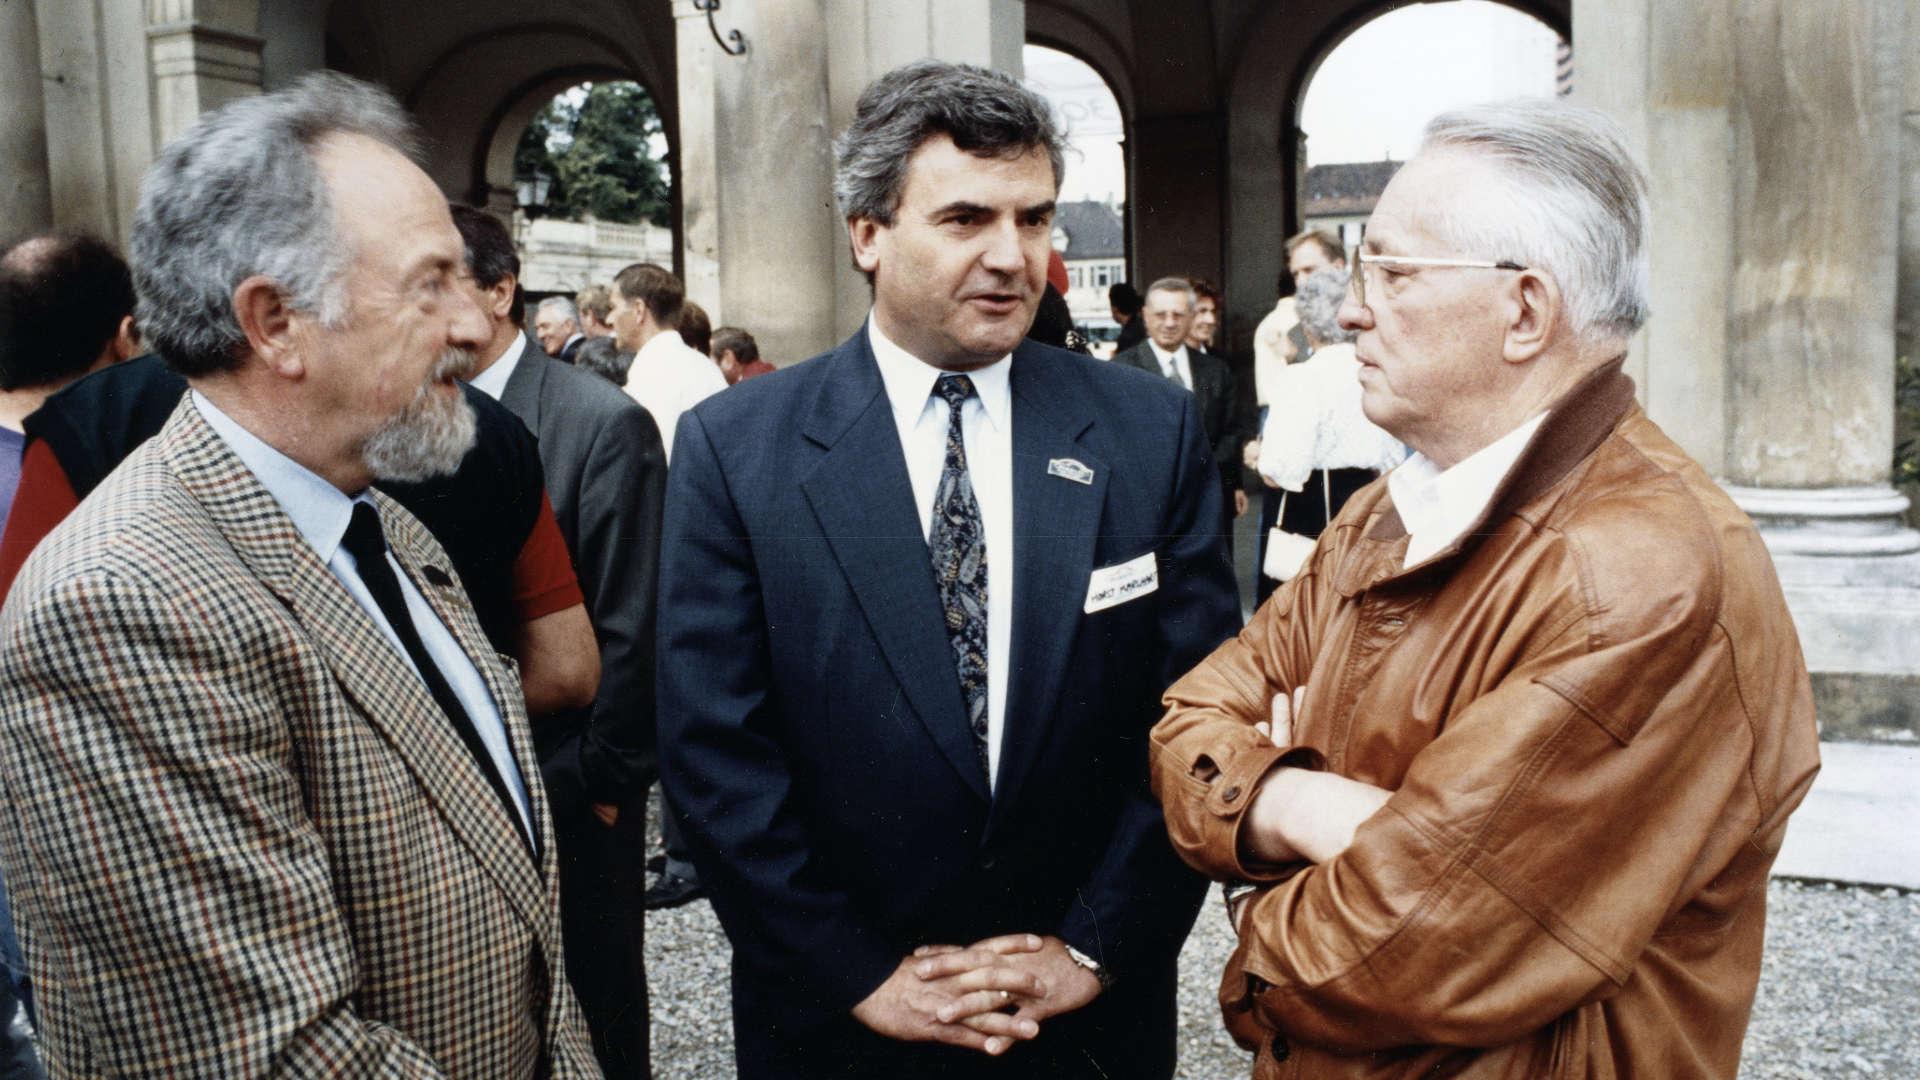 Ferdinand Alexander Porsche, Horst Marchart, Helmuth Bott, 1993